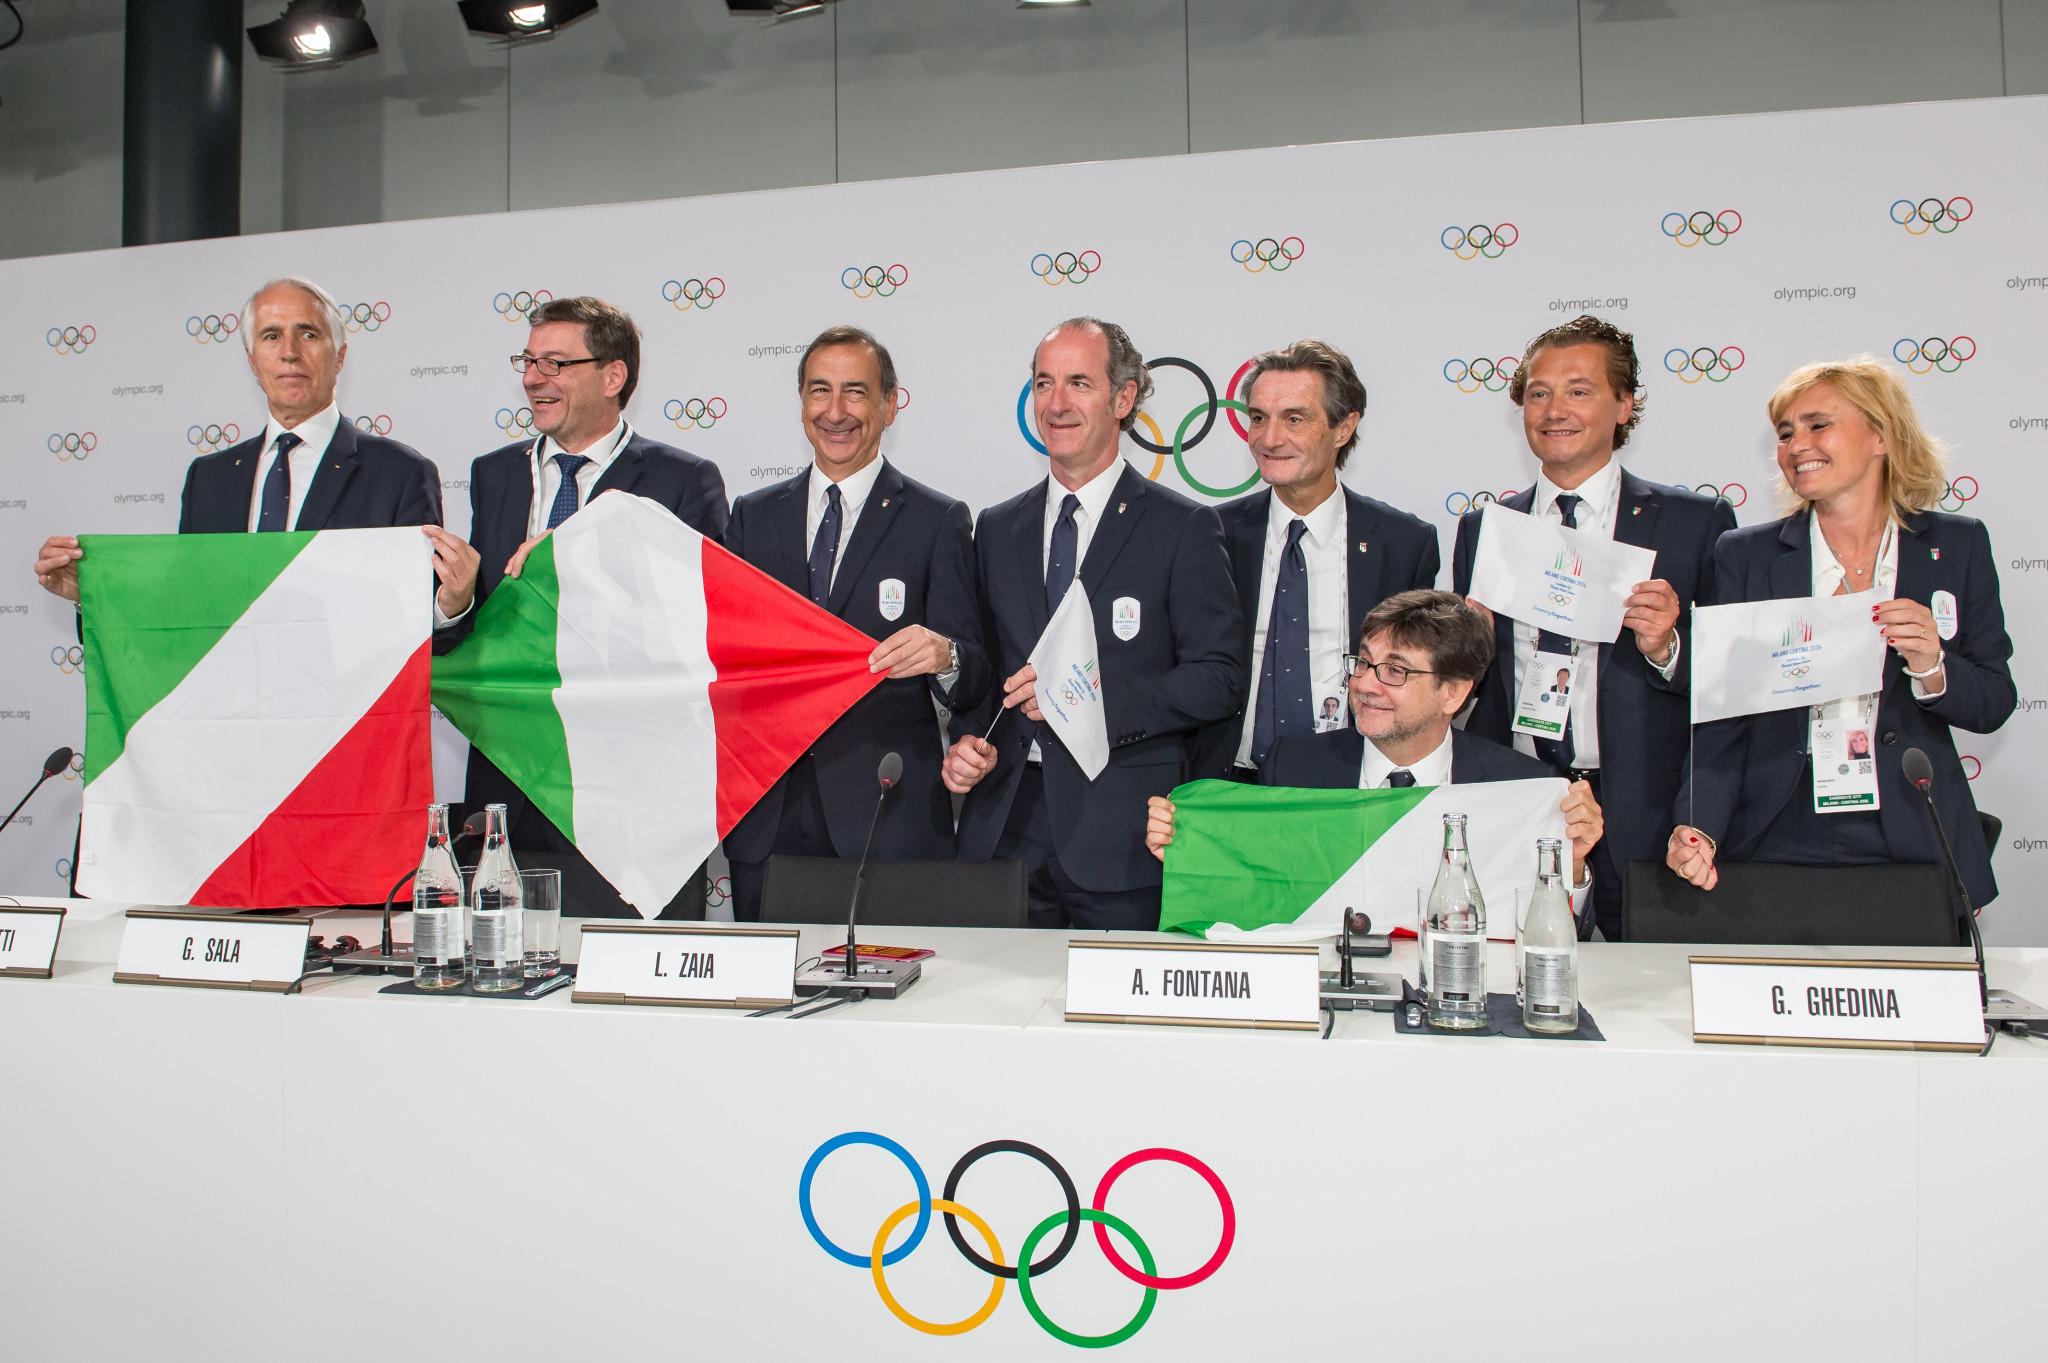 Sofia dalle Rive named new digital ambassador of Milan Cortina 2026